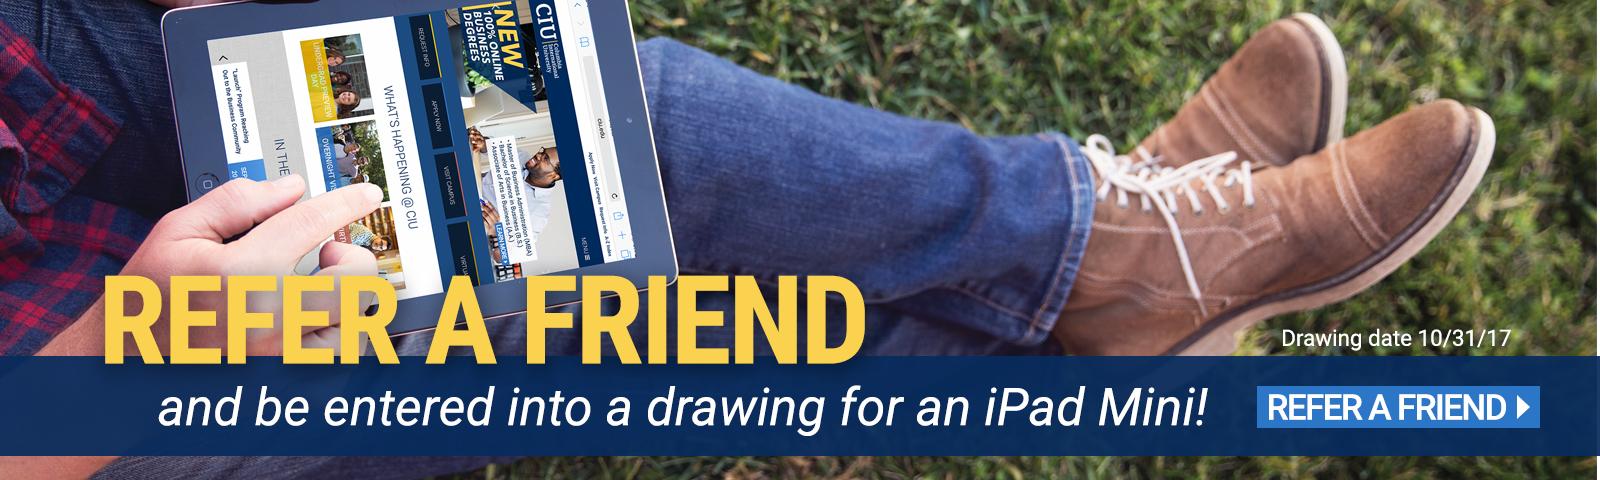 Refer a friend to CIU.